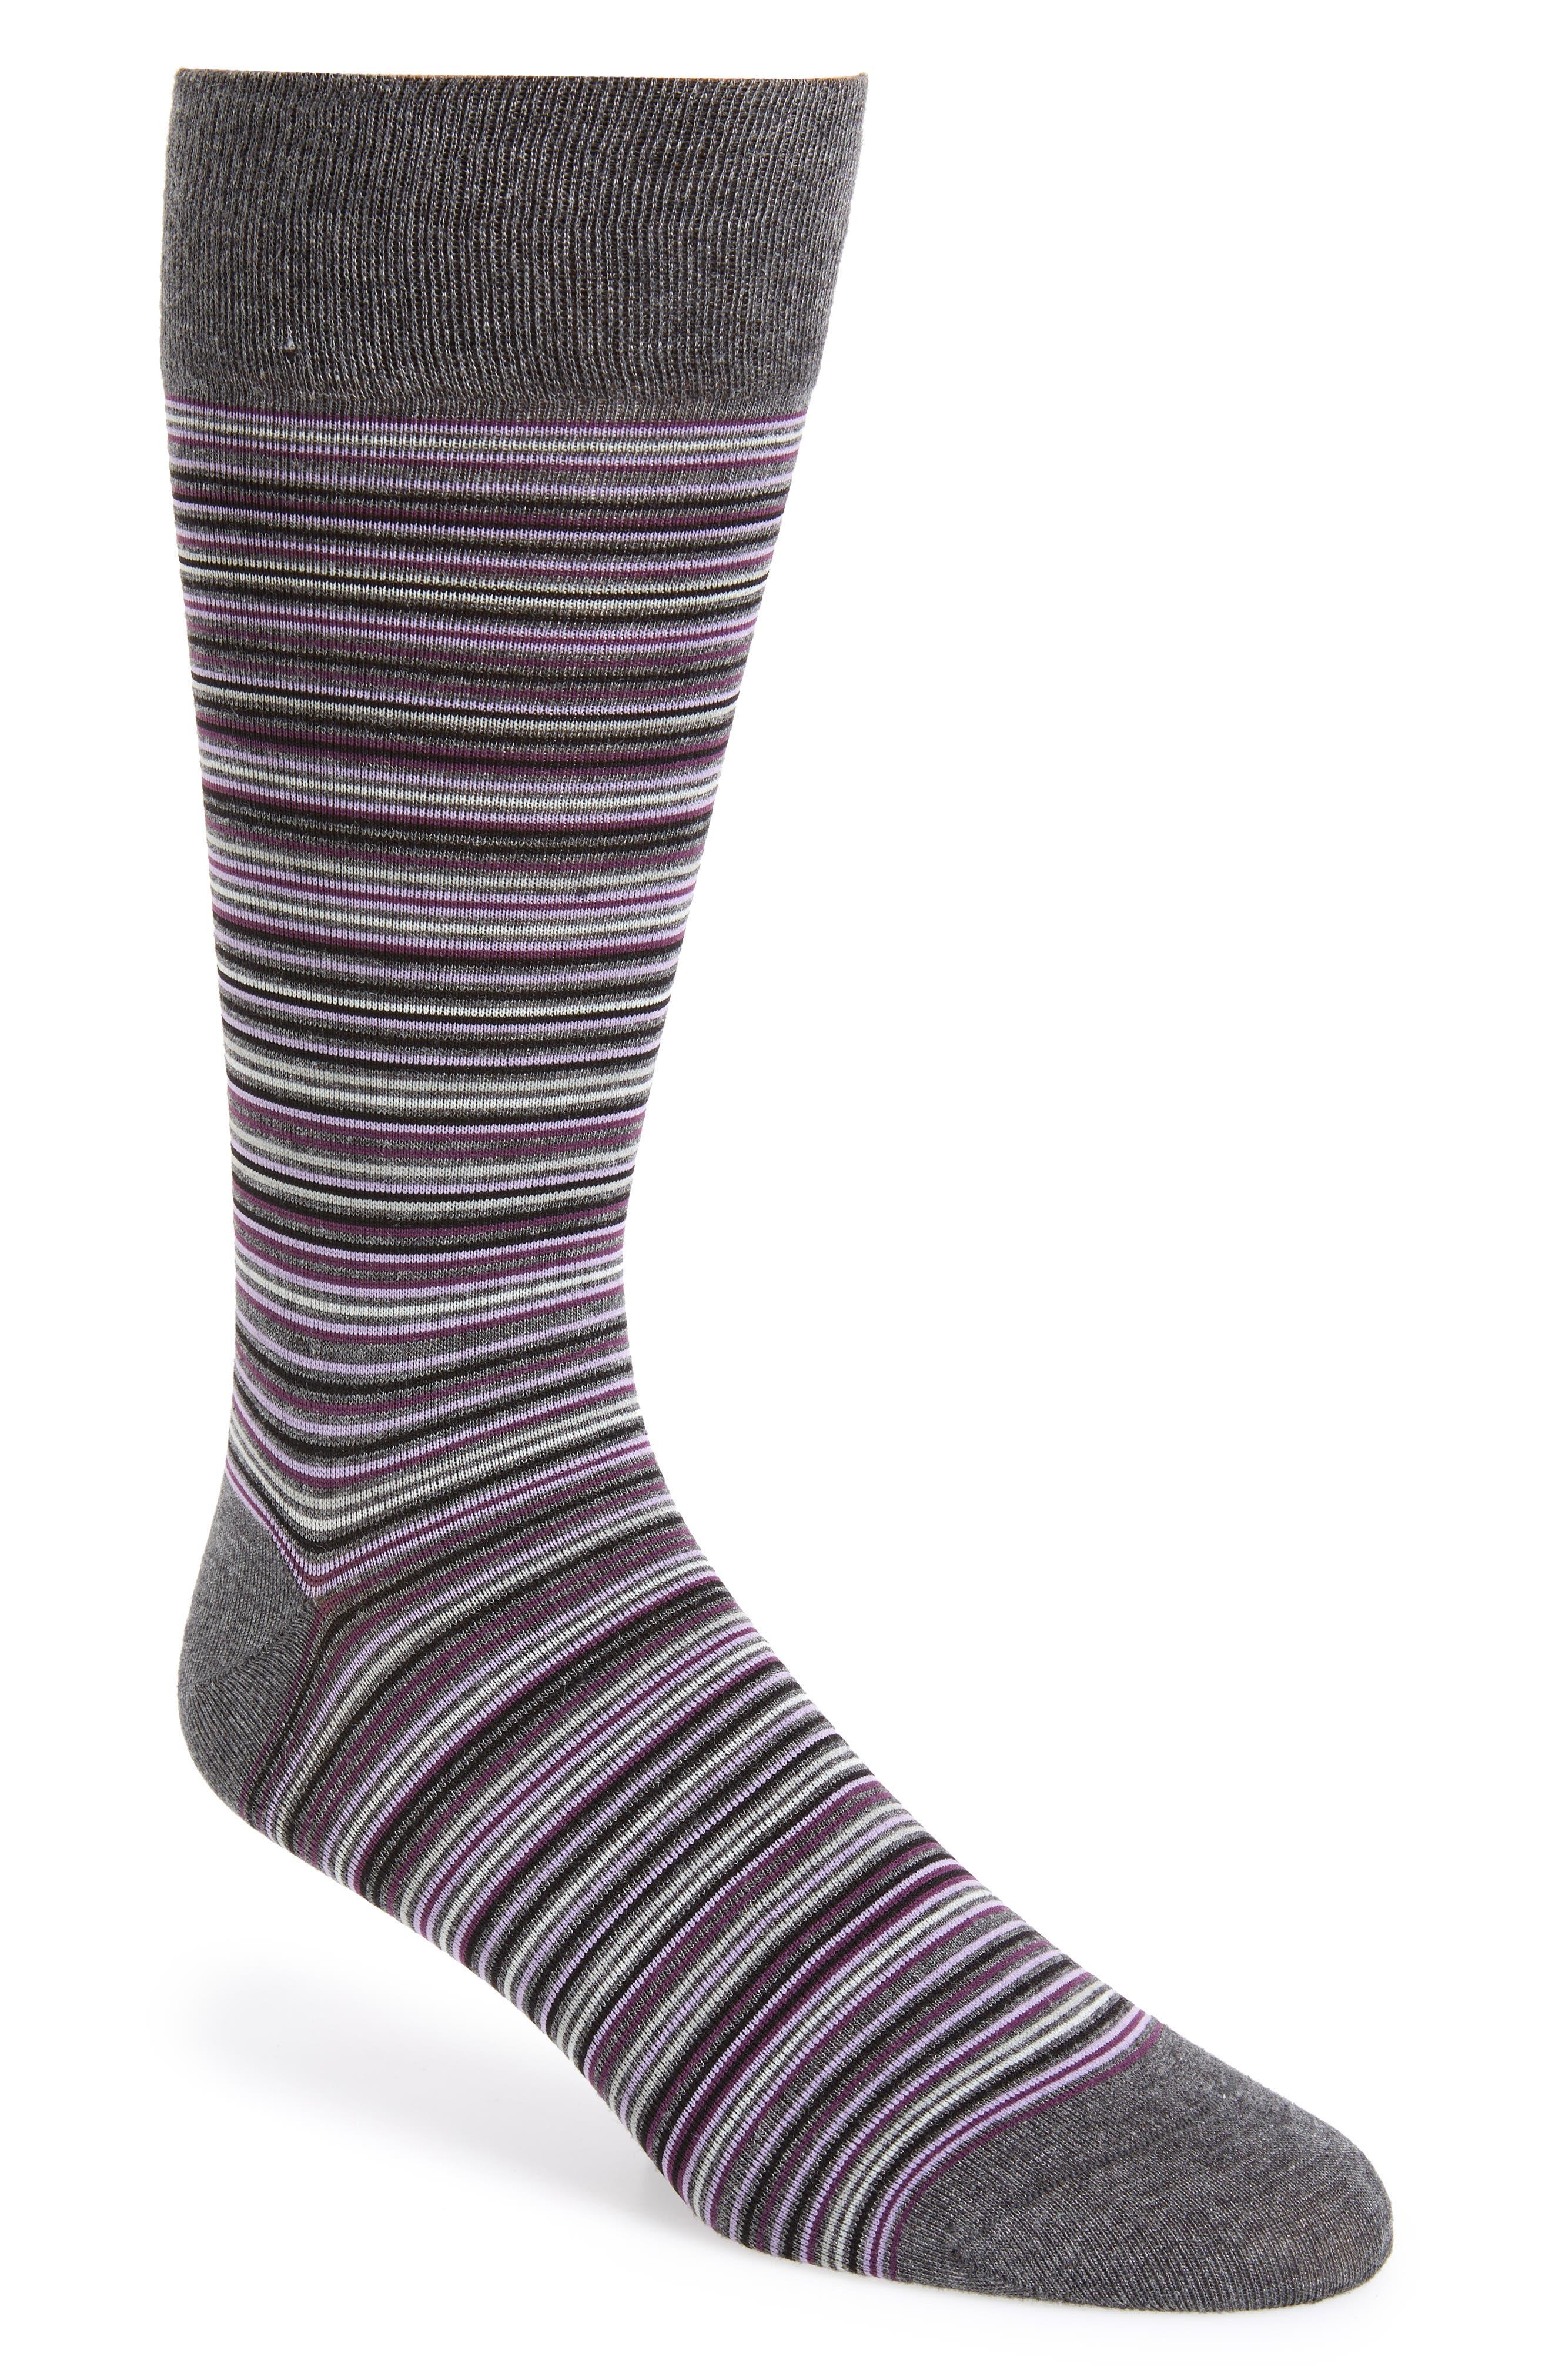 Multistripe Crew Socks,                             Main thumbnail 1, color,                             CHARCOAL HEATHER/ PURPLE